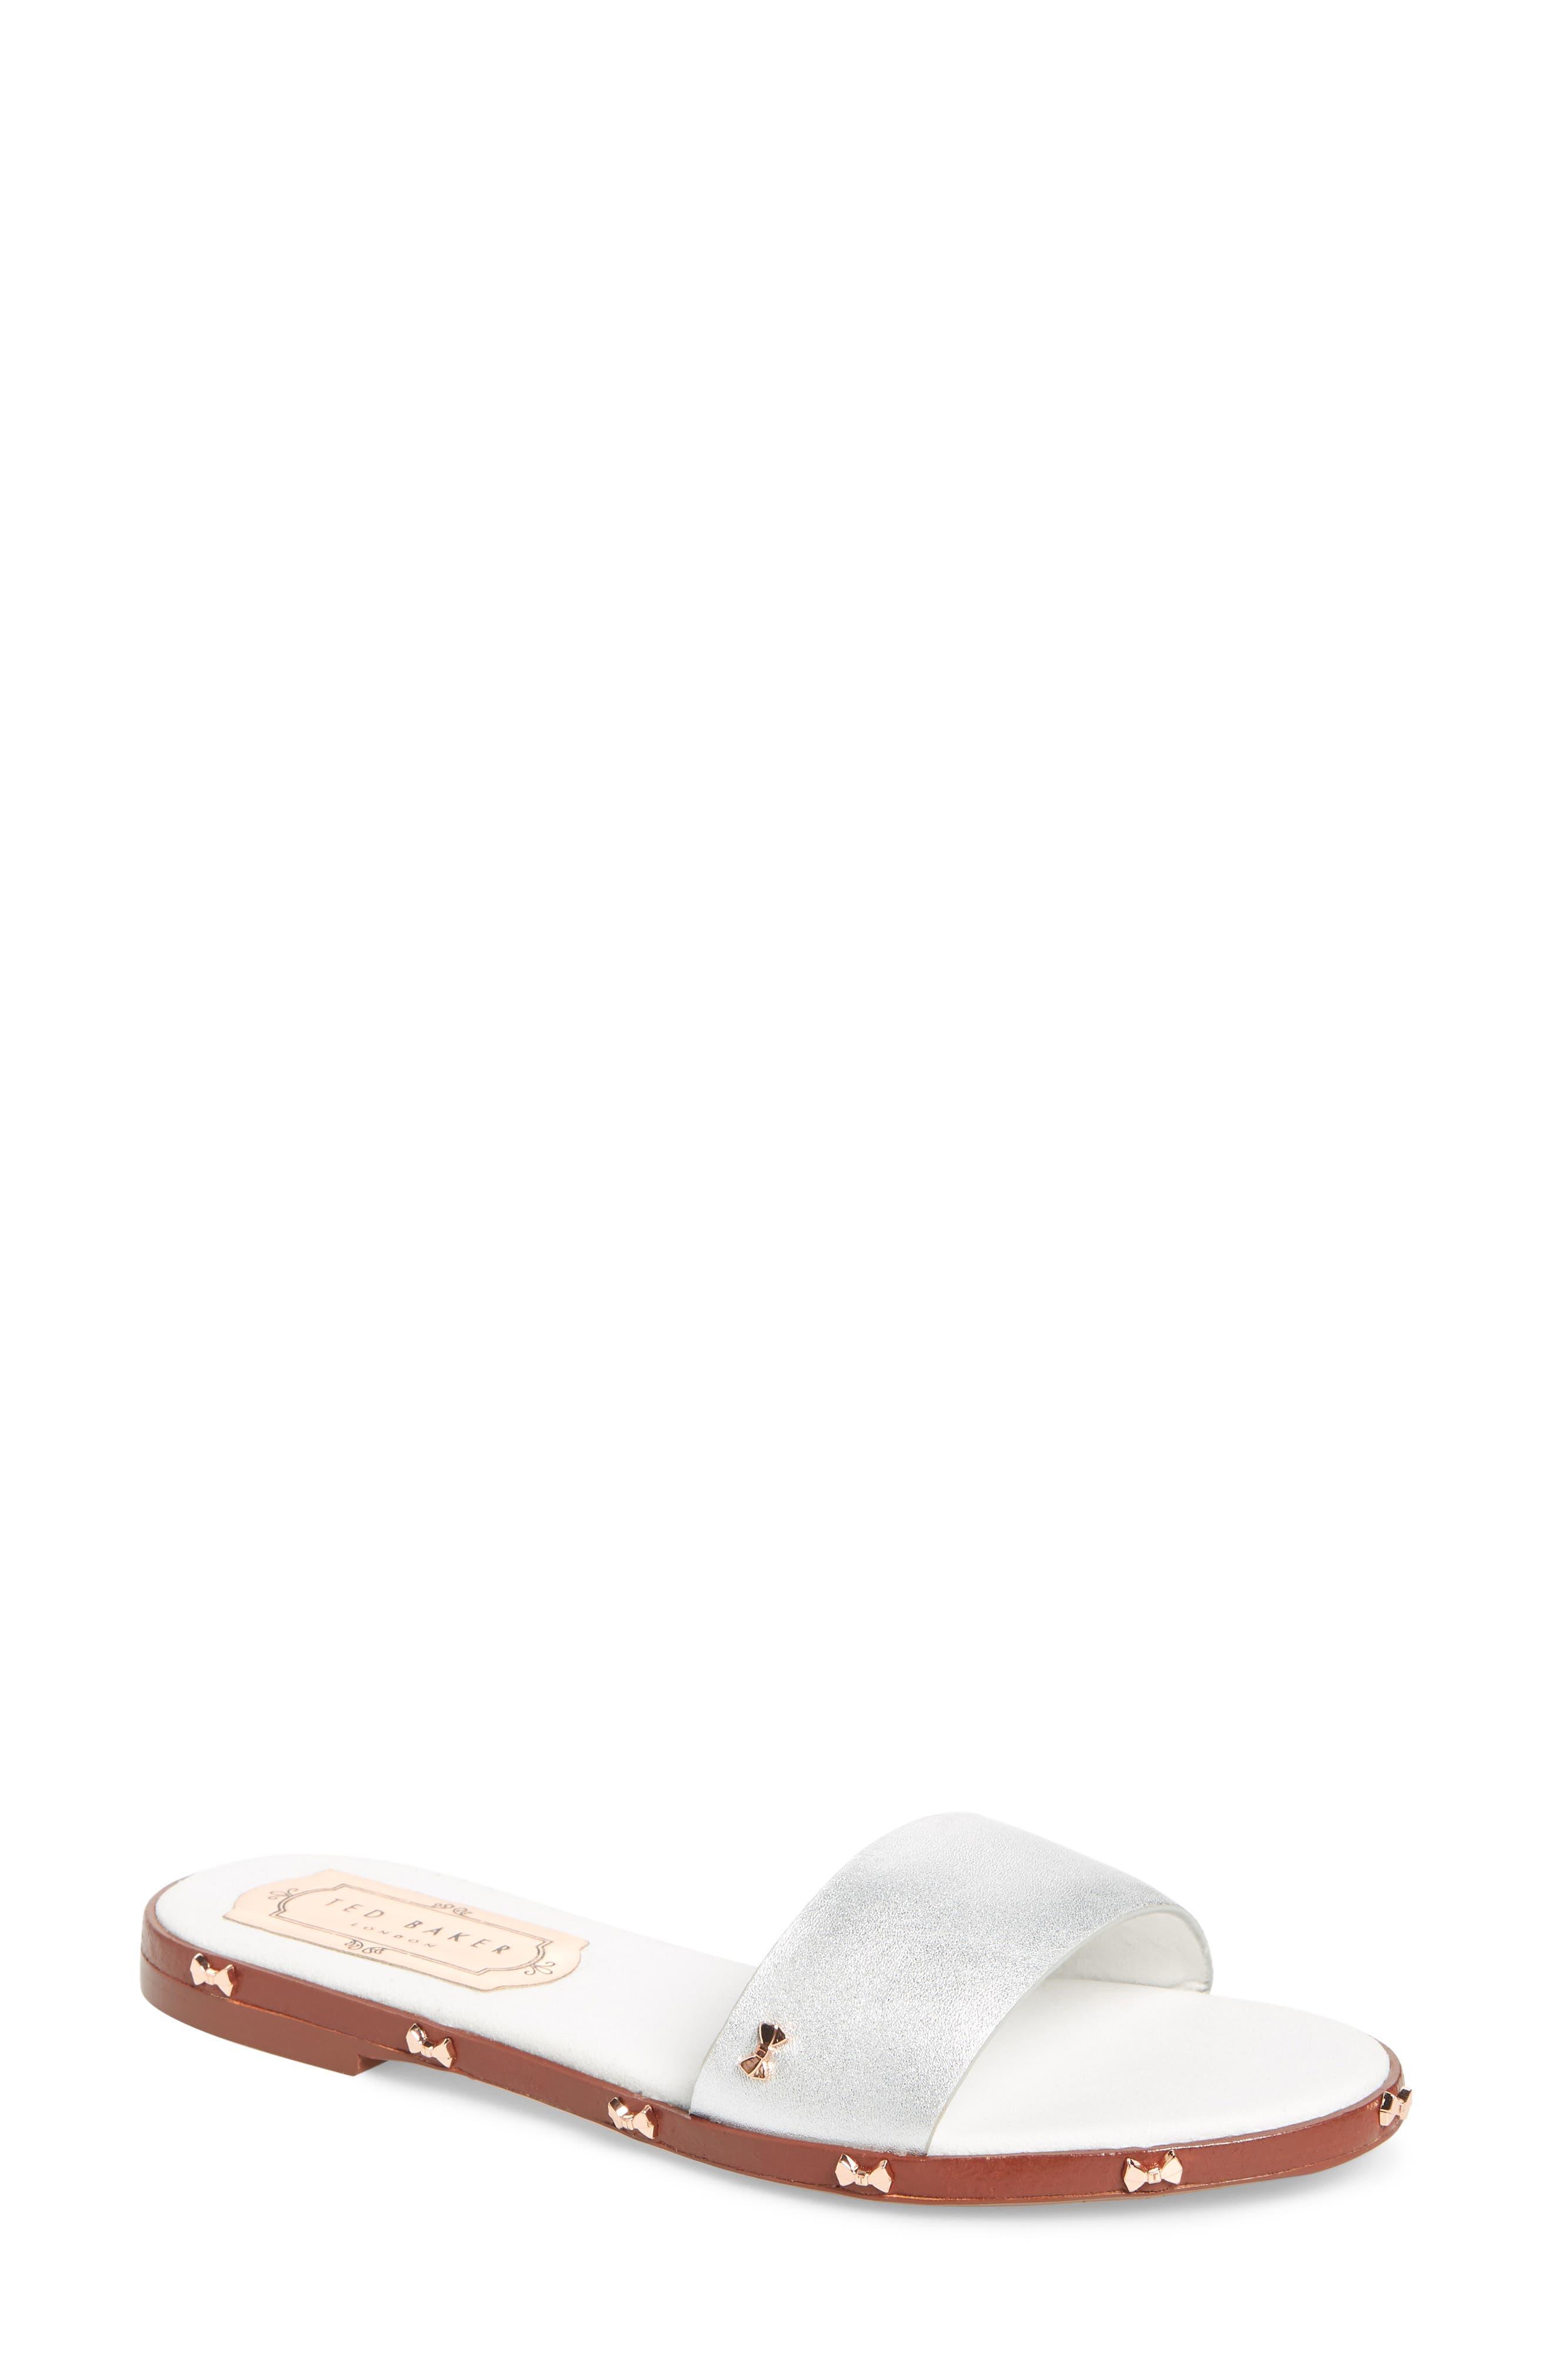 Kytti Slide Sandal,                             Main thumbnail 1, color,                             Silver Leather